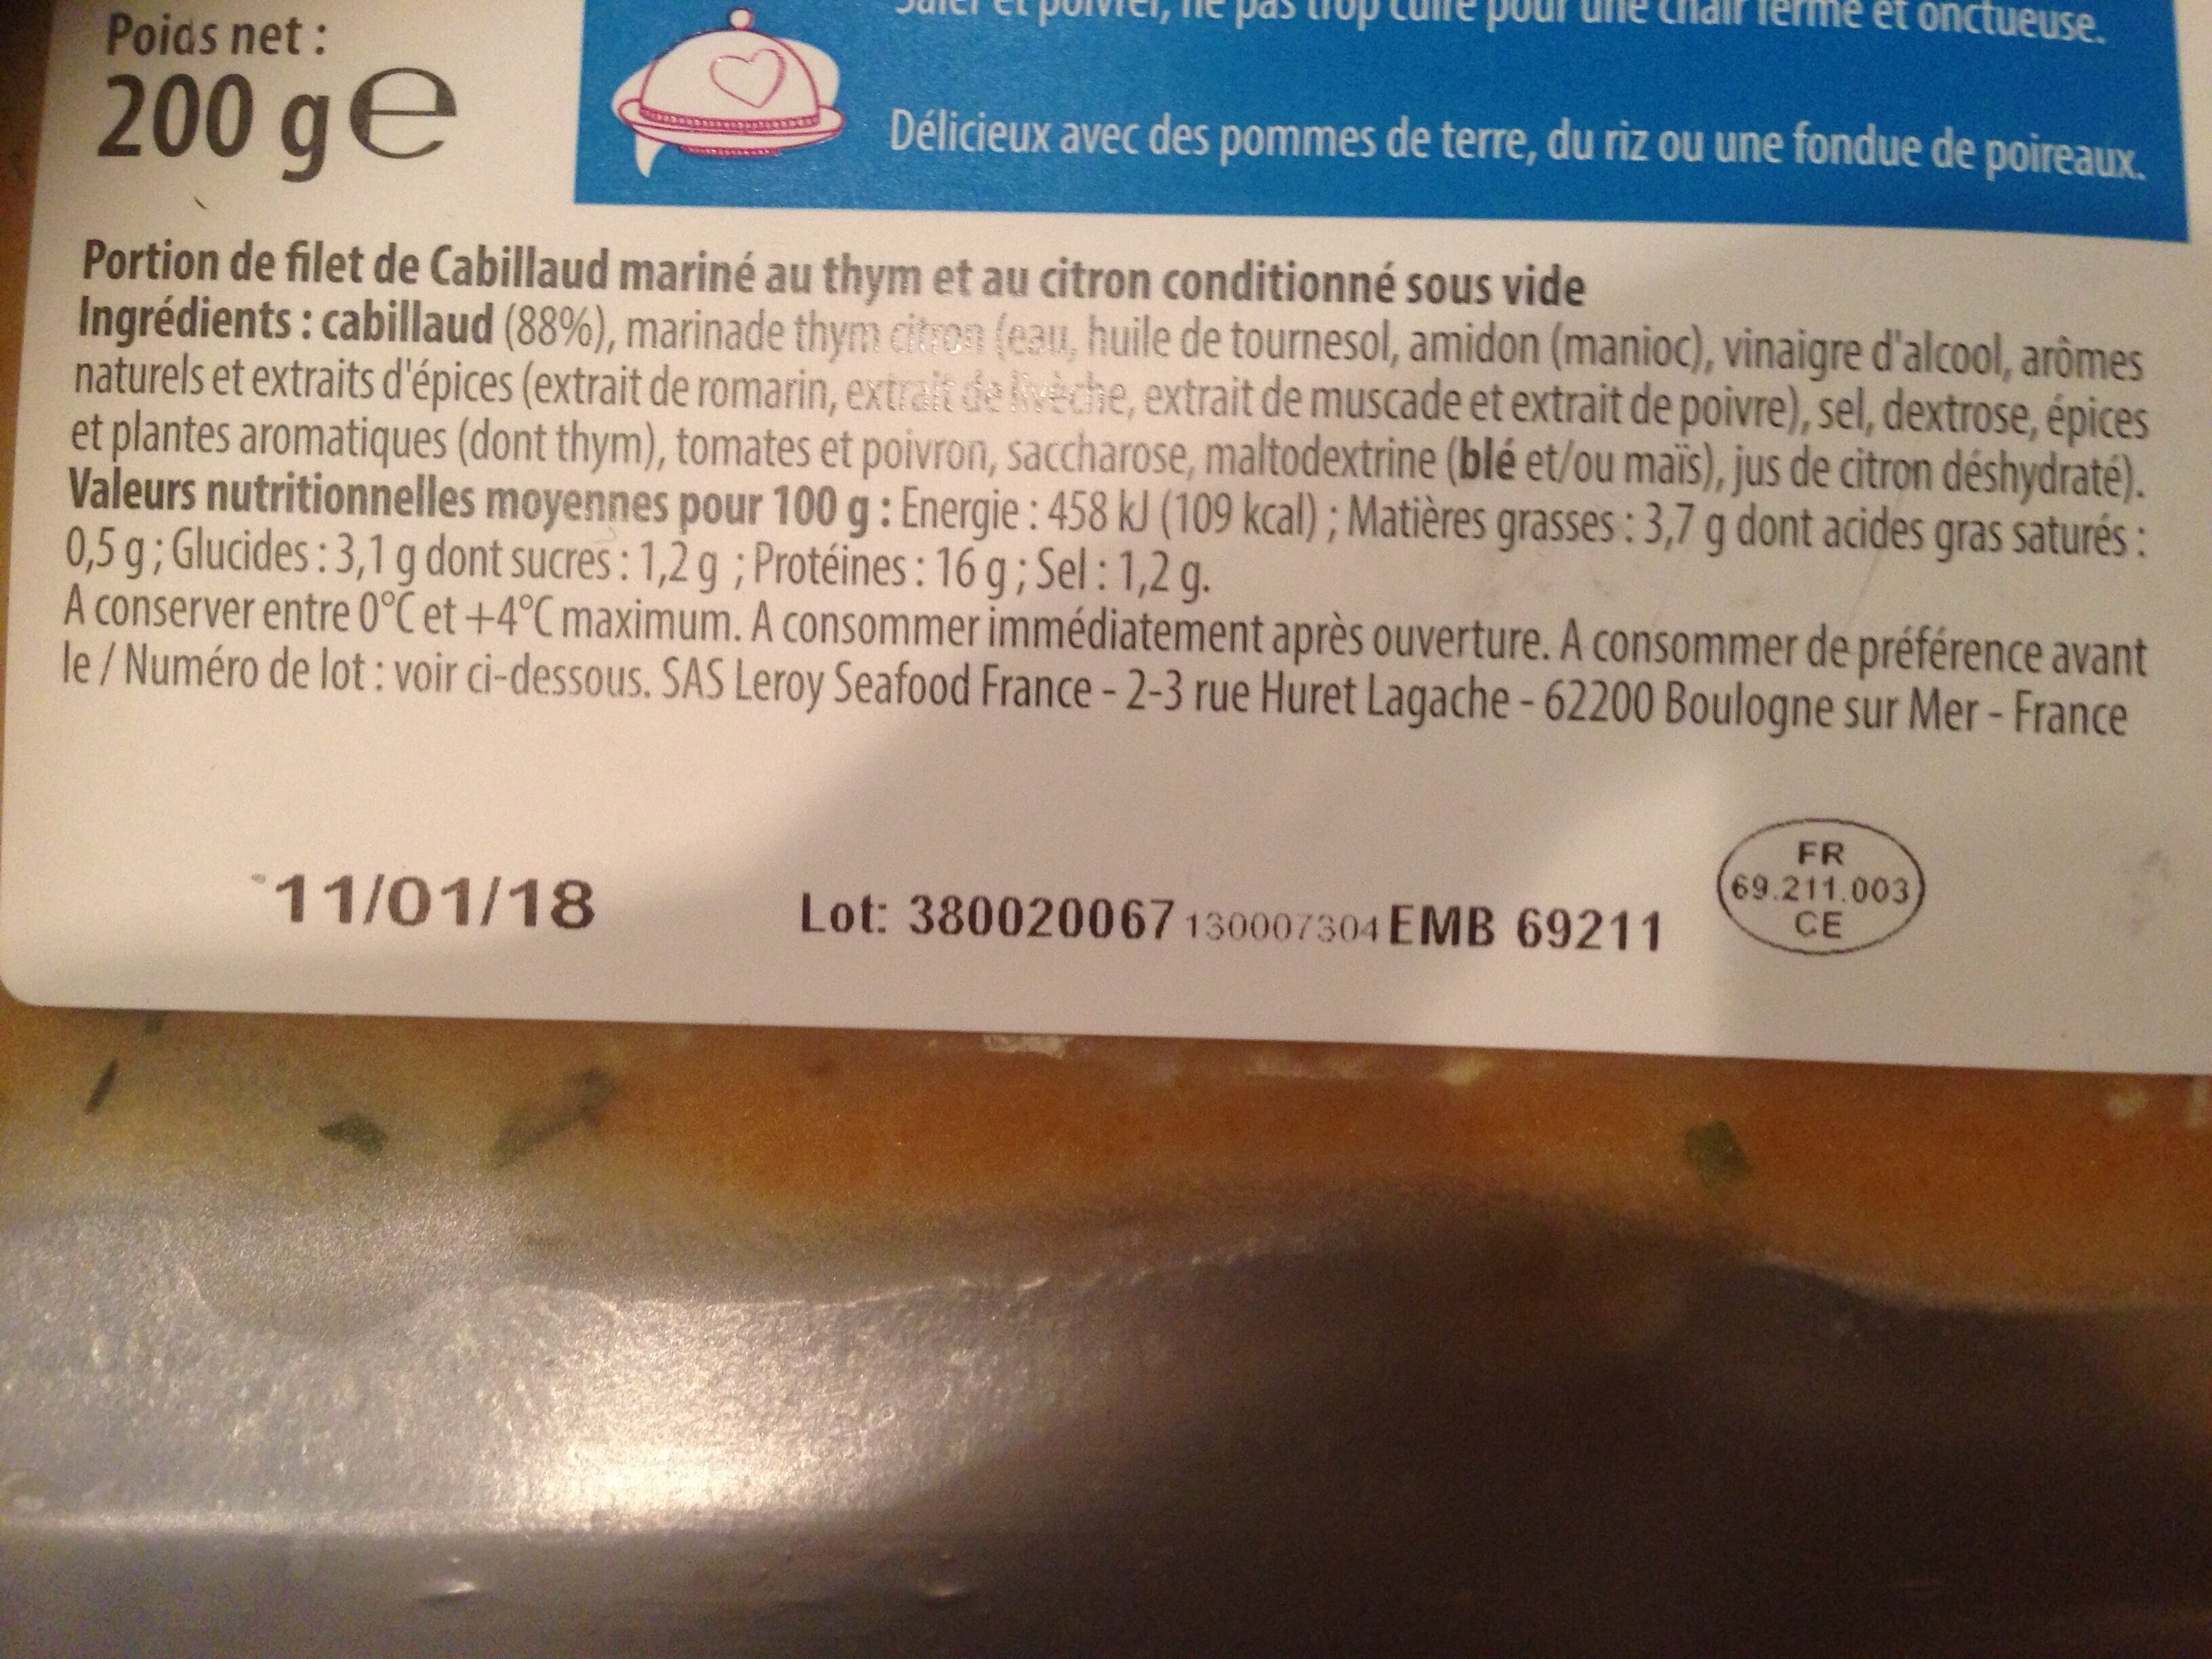 Cabillaud mariné thym citron - Ingrediënten